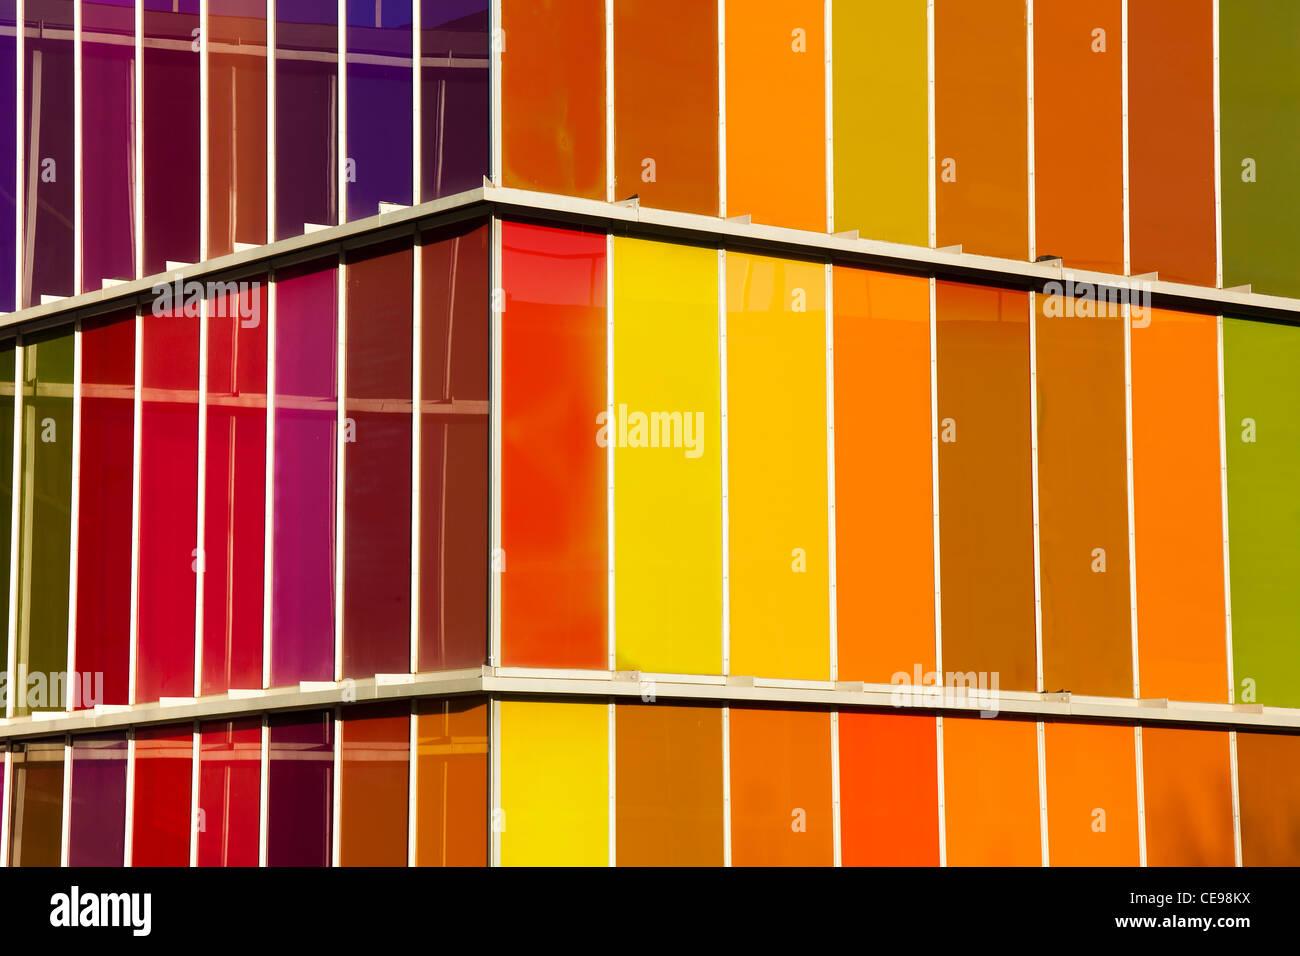 MUSAC museum, Leon, Castilla y Leon, Spain - Stock Image